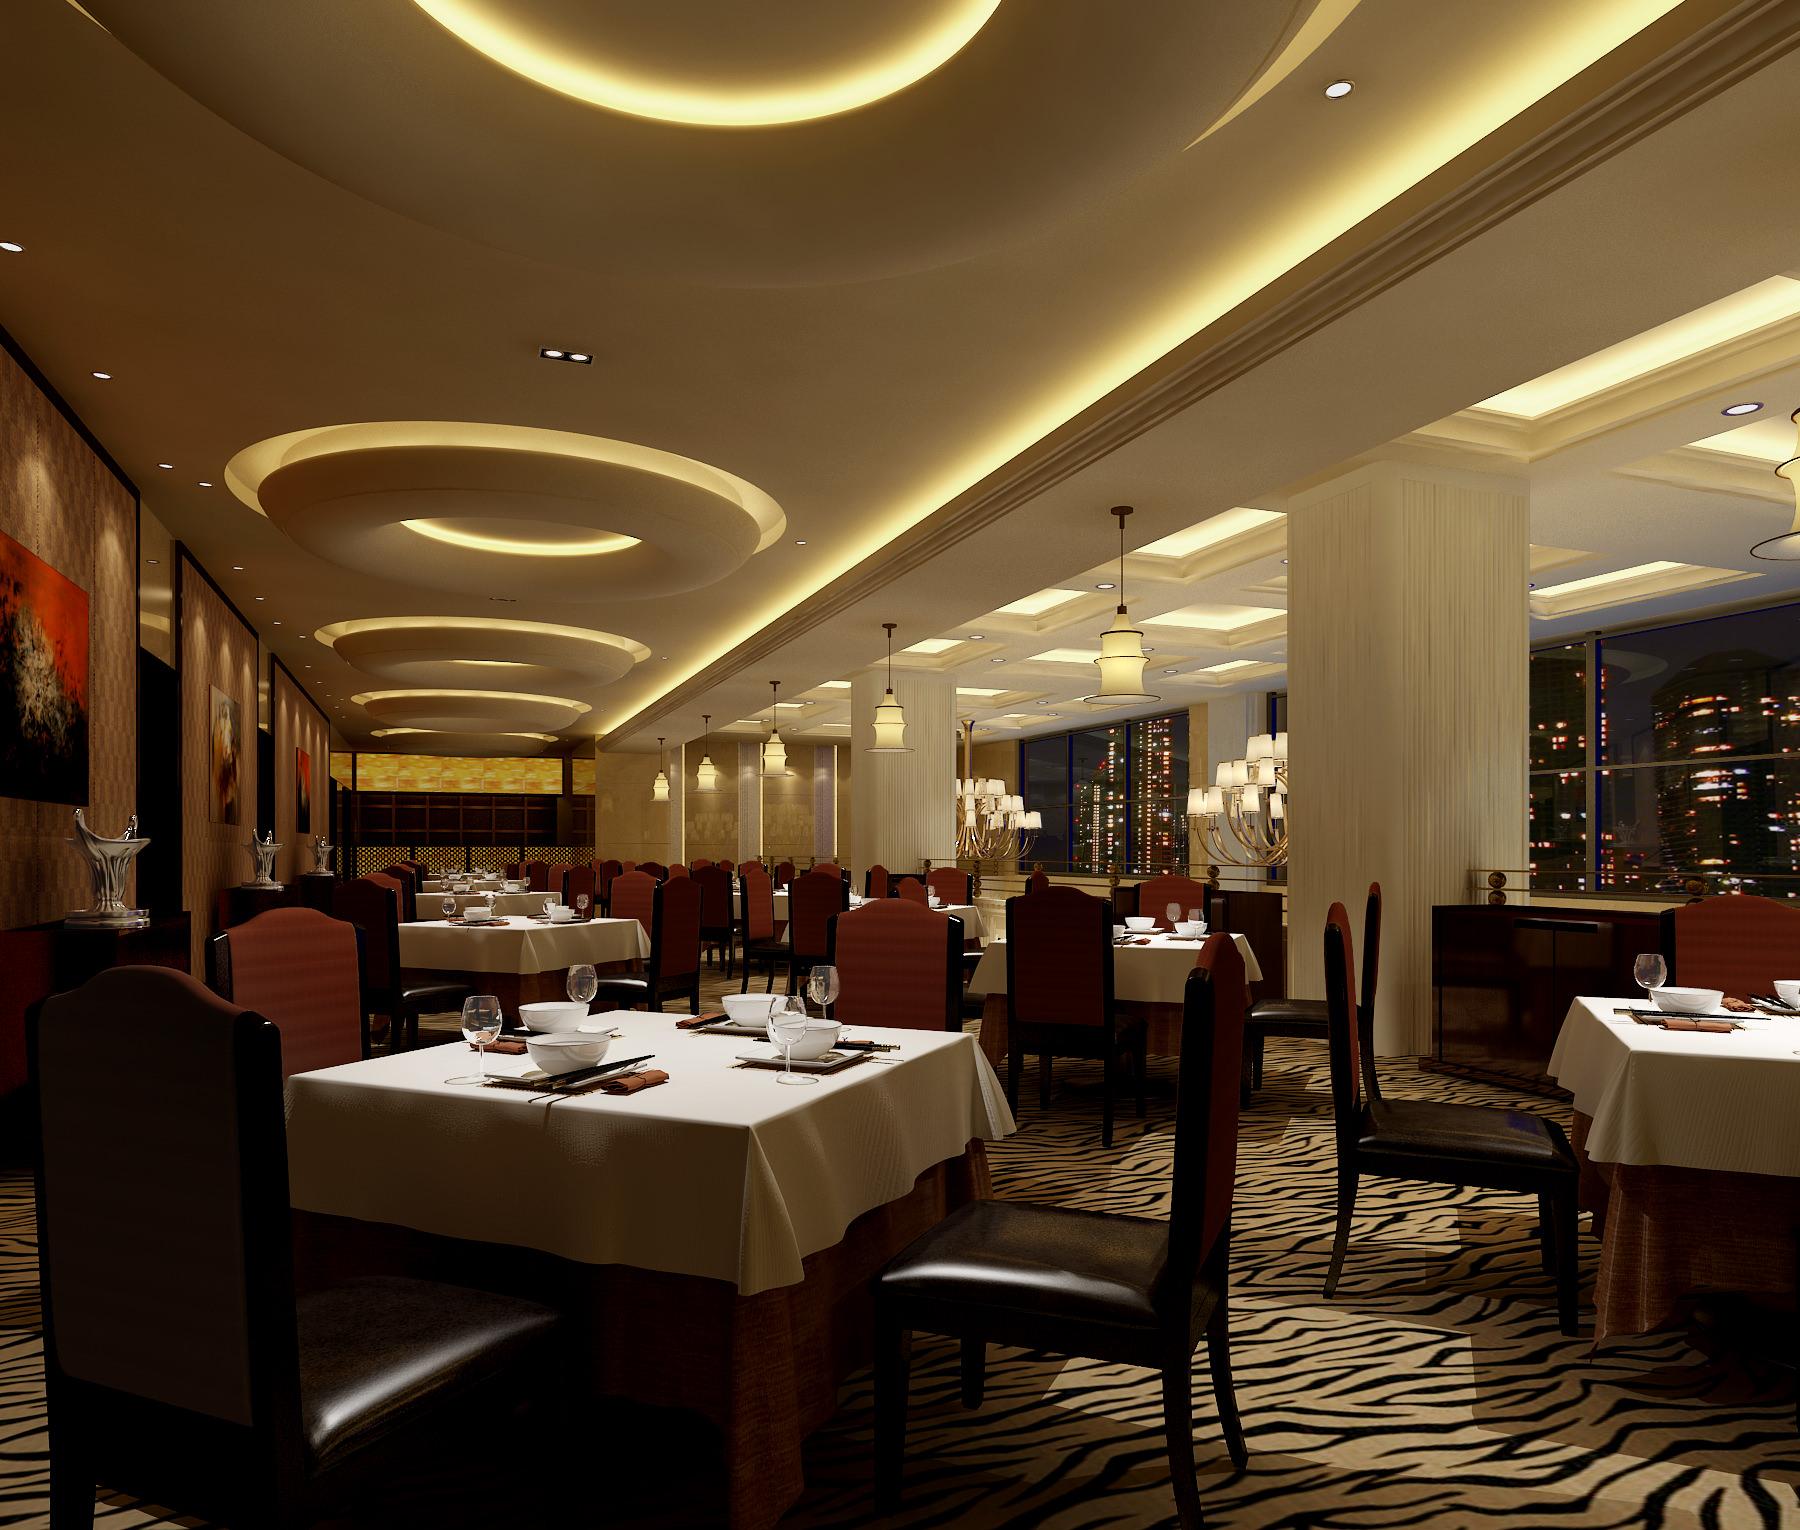 Restaurant 3d model max for Restaurant 3d max